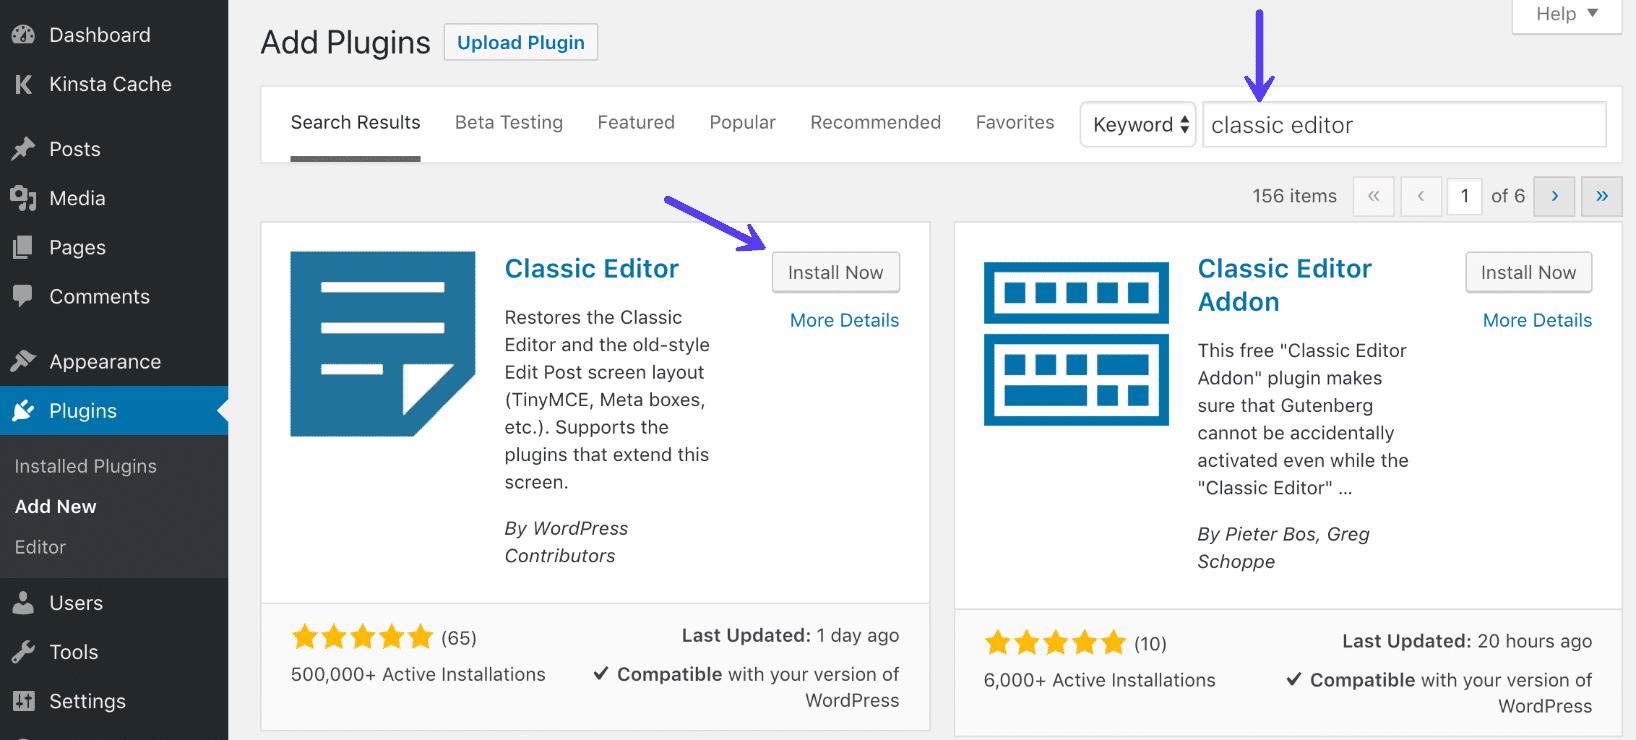 Installer le plugin WordPress Classic Editor